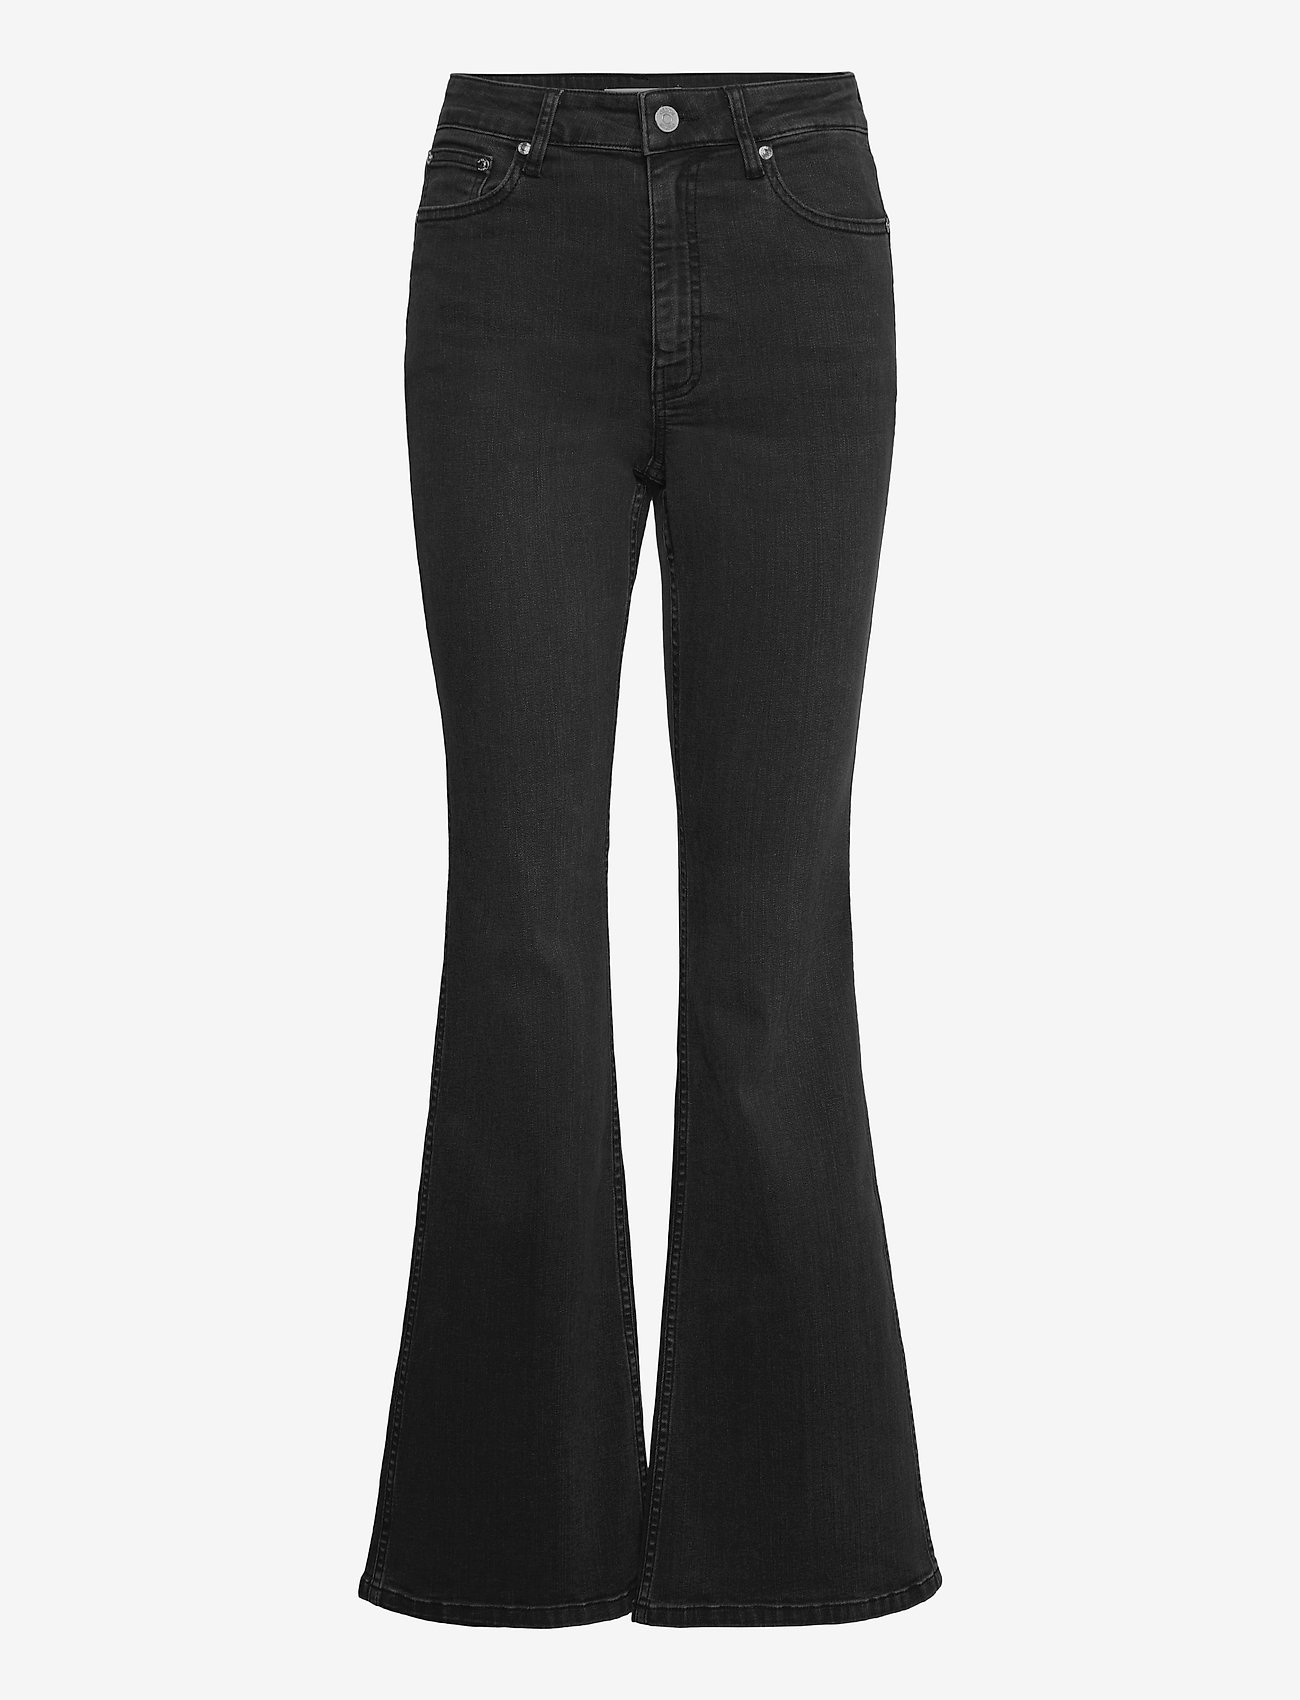 Gestuz - EmilindaGZ HW flared jeans NOOS - schlaghosen - washed grey - 0